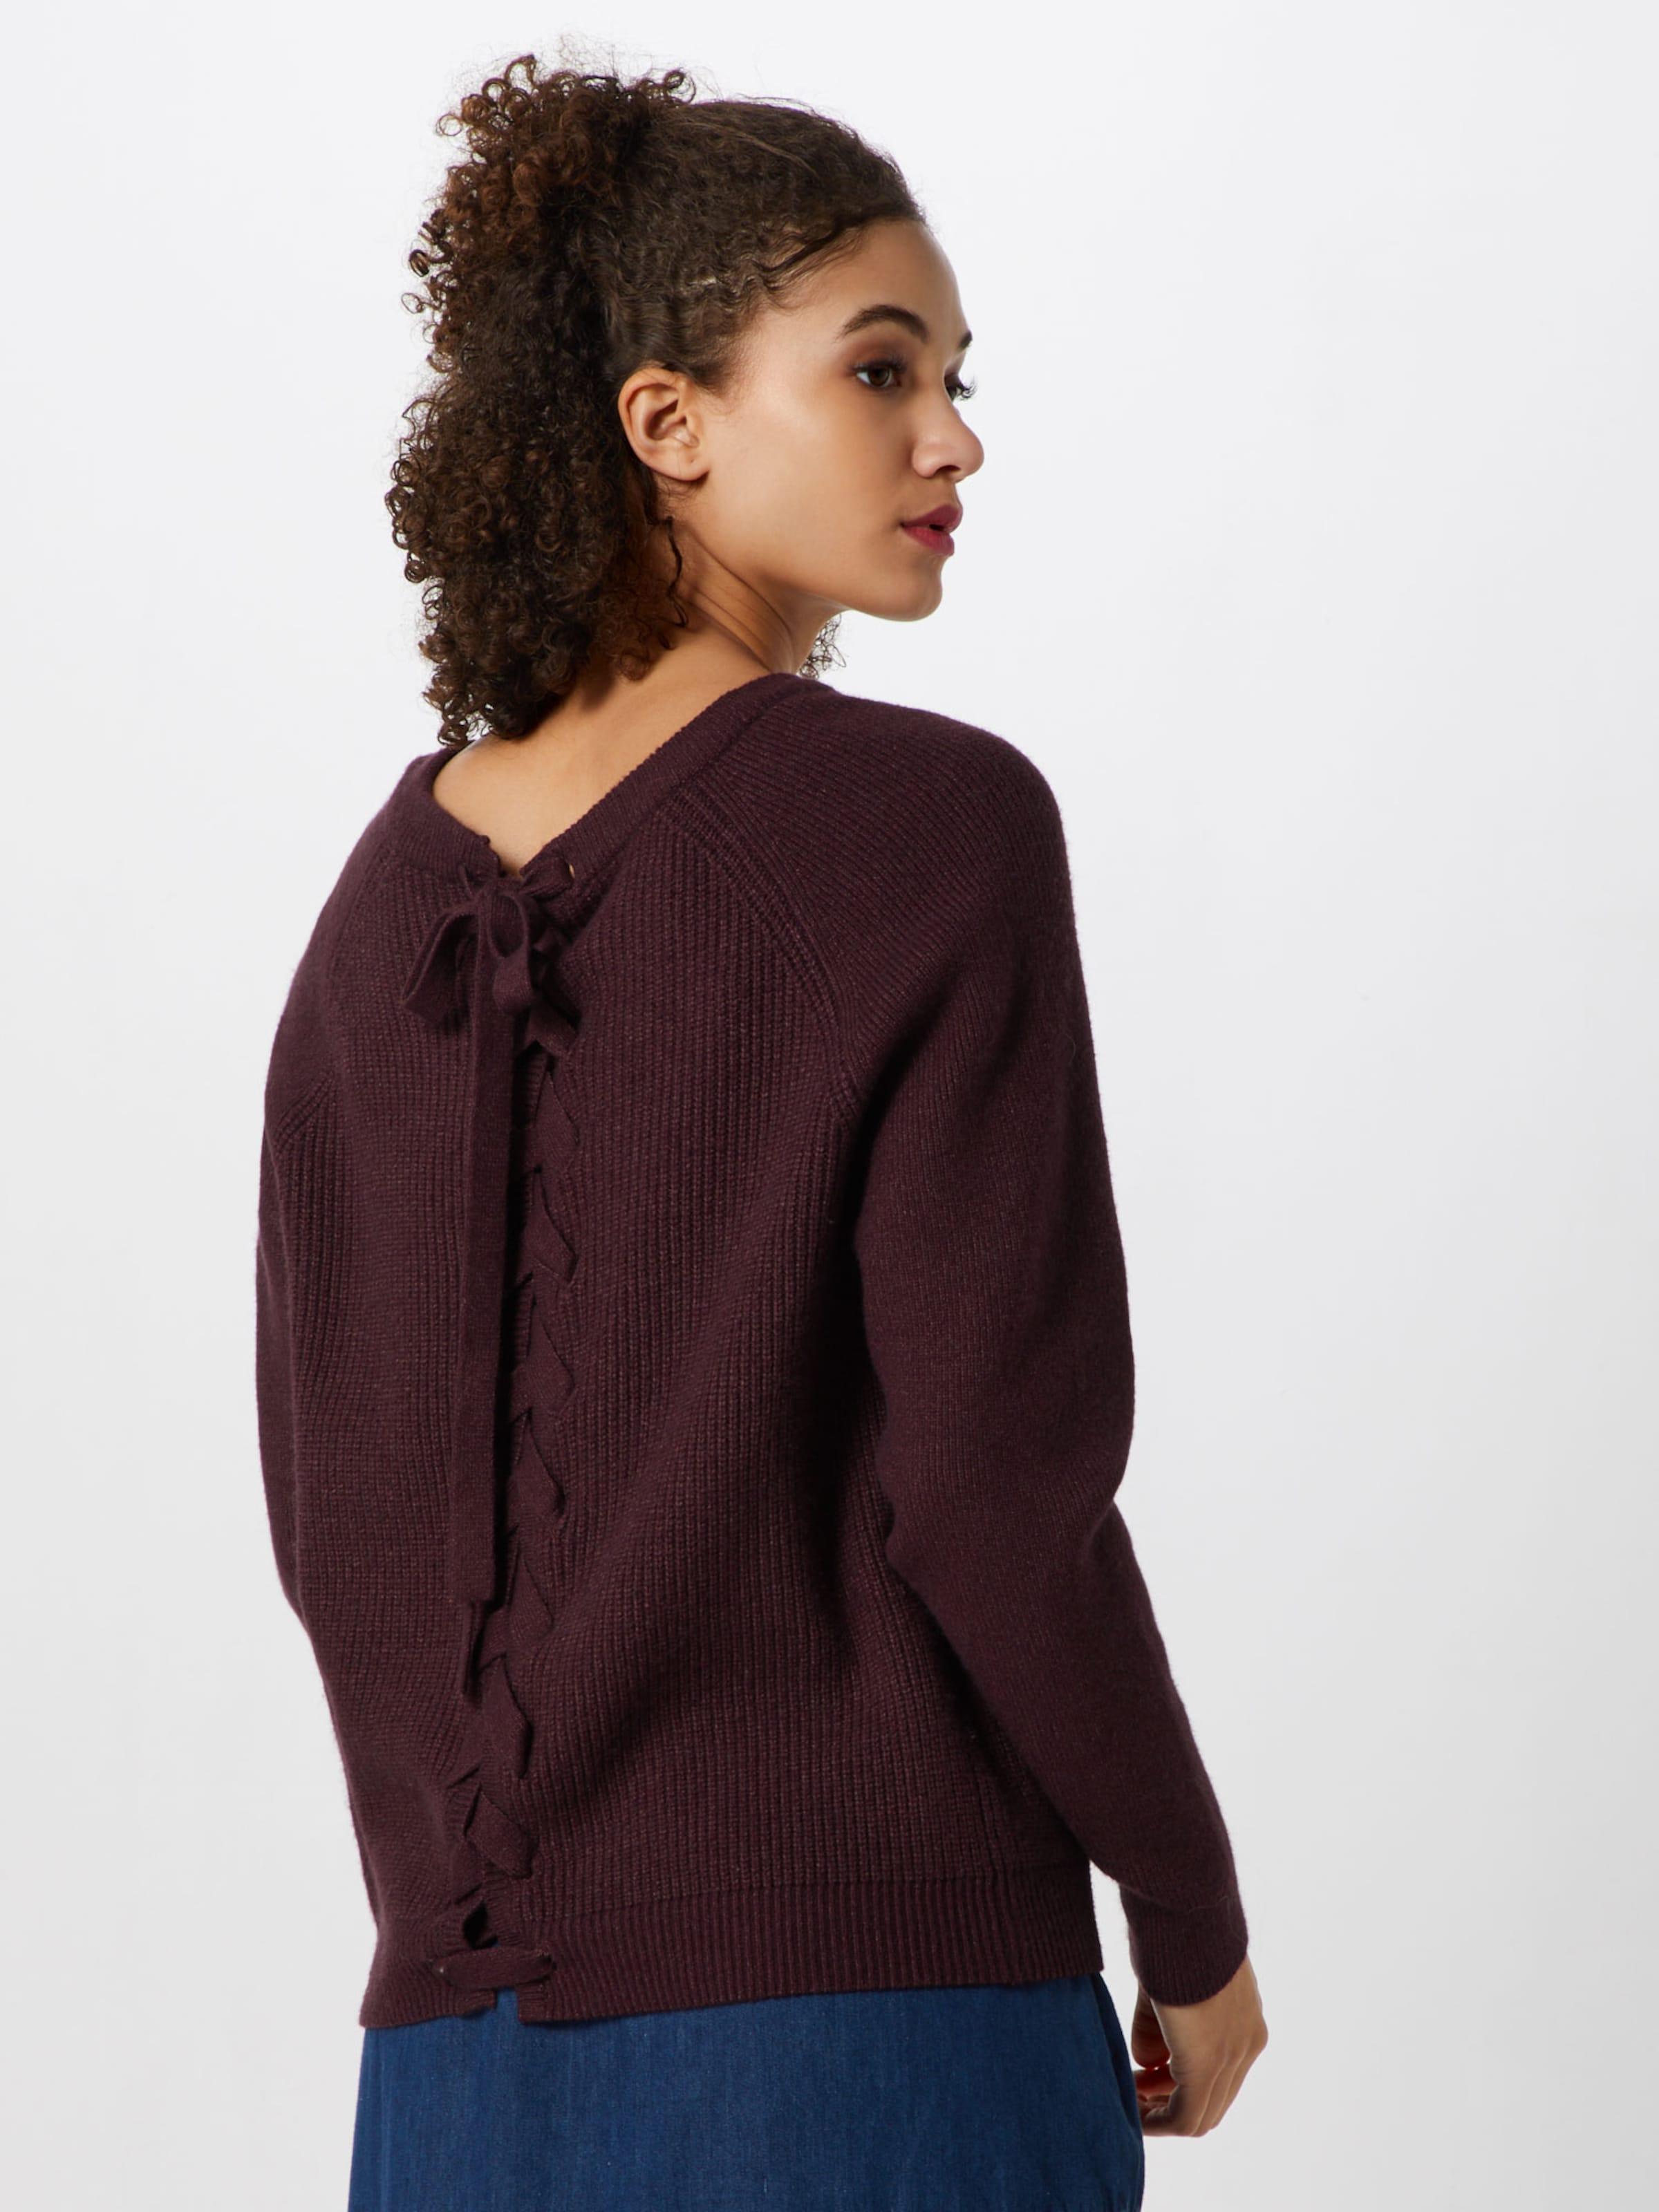 En Back Vila Pull 'visia Laced Top' Up Knit Beige over s L WE2eDHIY9